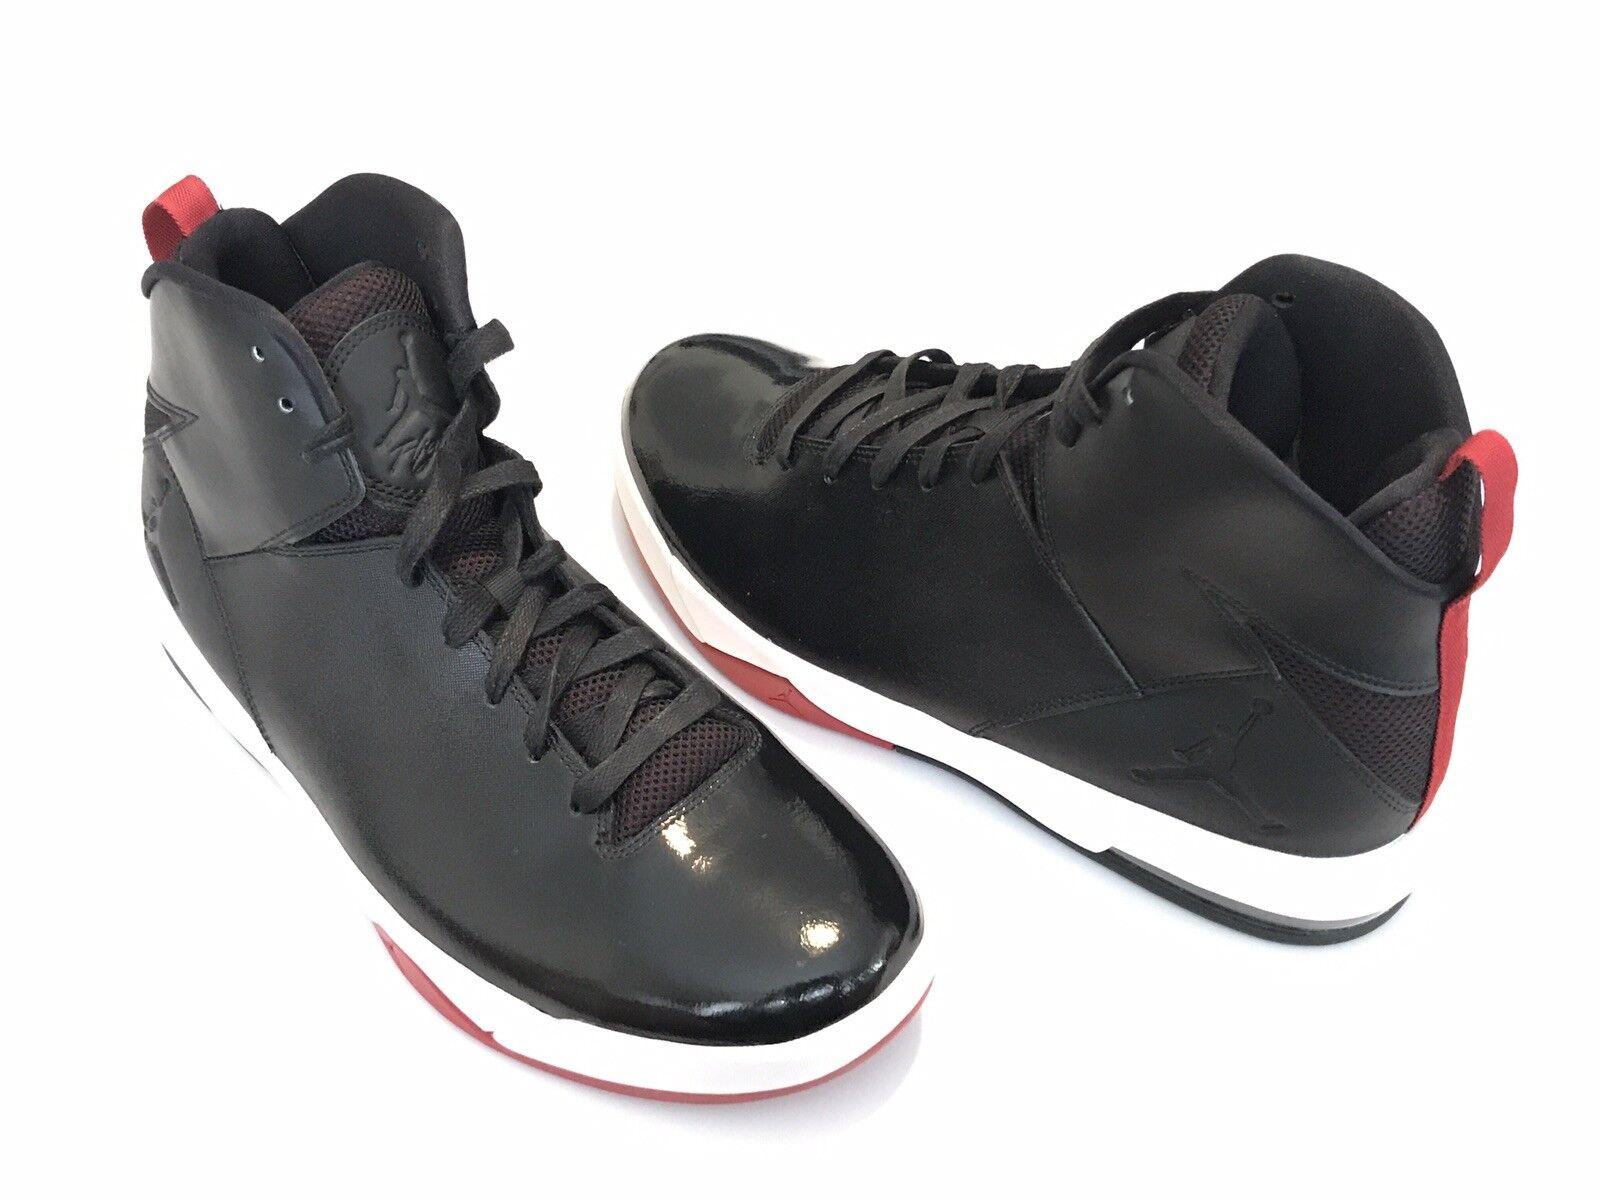 Nuevo Jordan Imminent para hombre 705077-001 Negro Rojo Air Calzado De Baloncesto Hombres